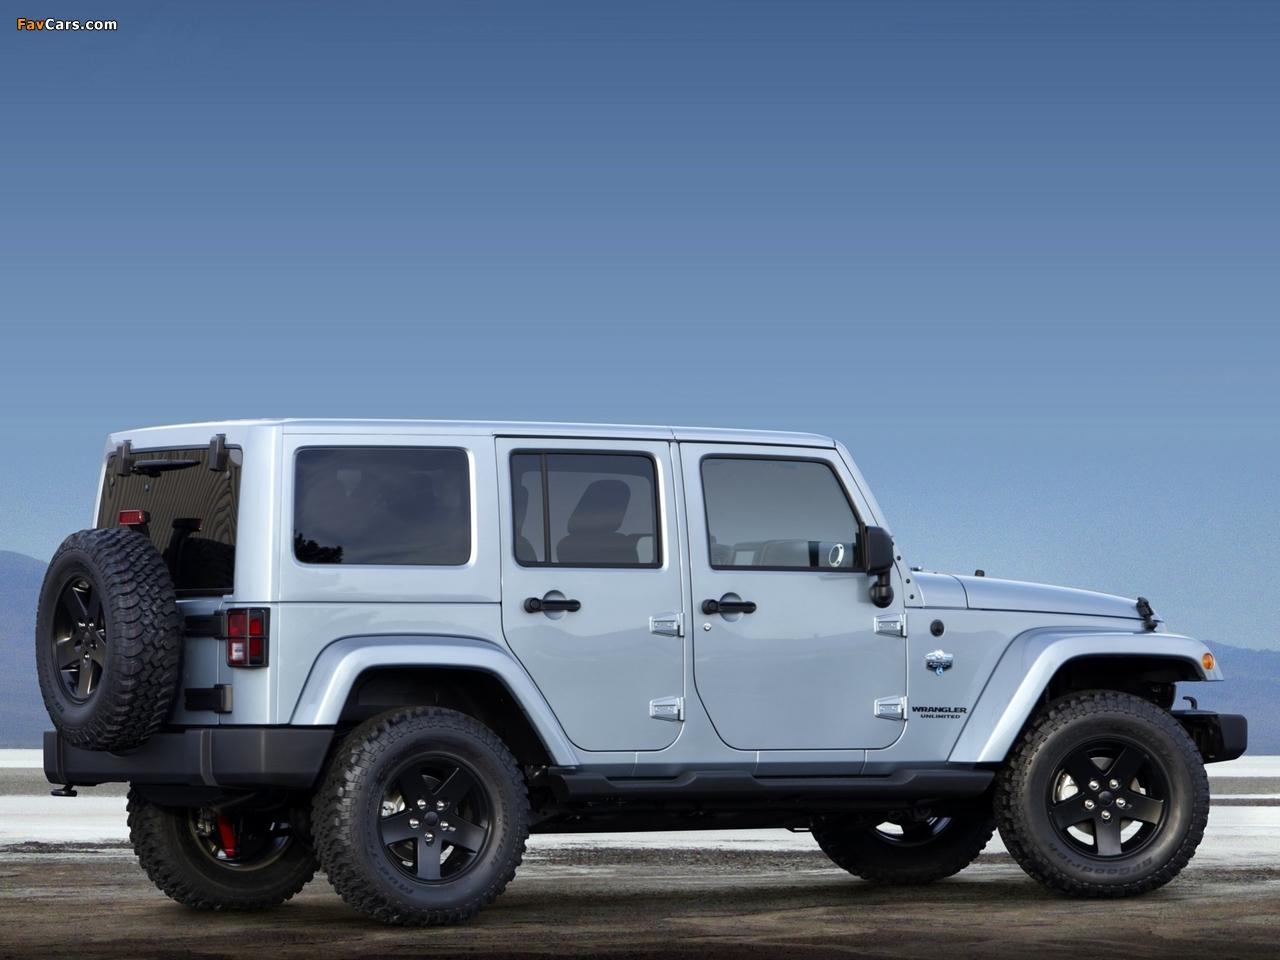 Jeep Wrangler Unlimited Arctic (JK) 2012 photos (1280 x 960)